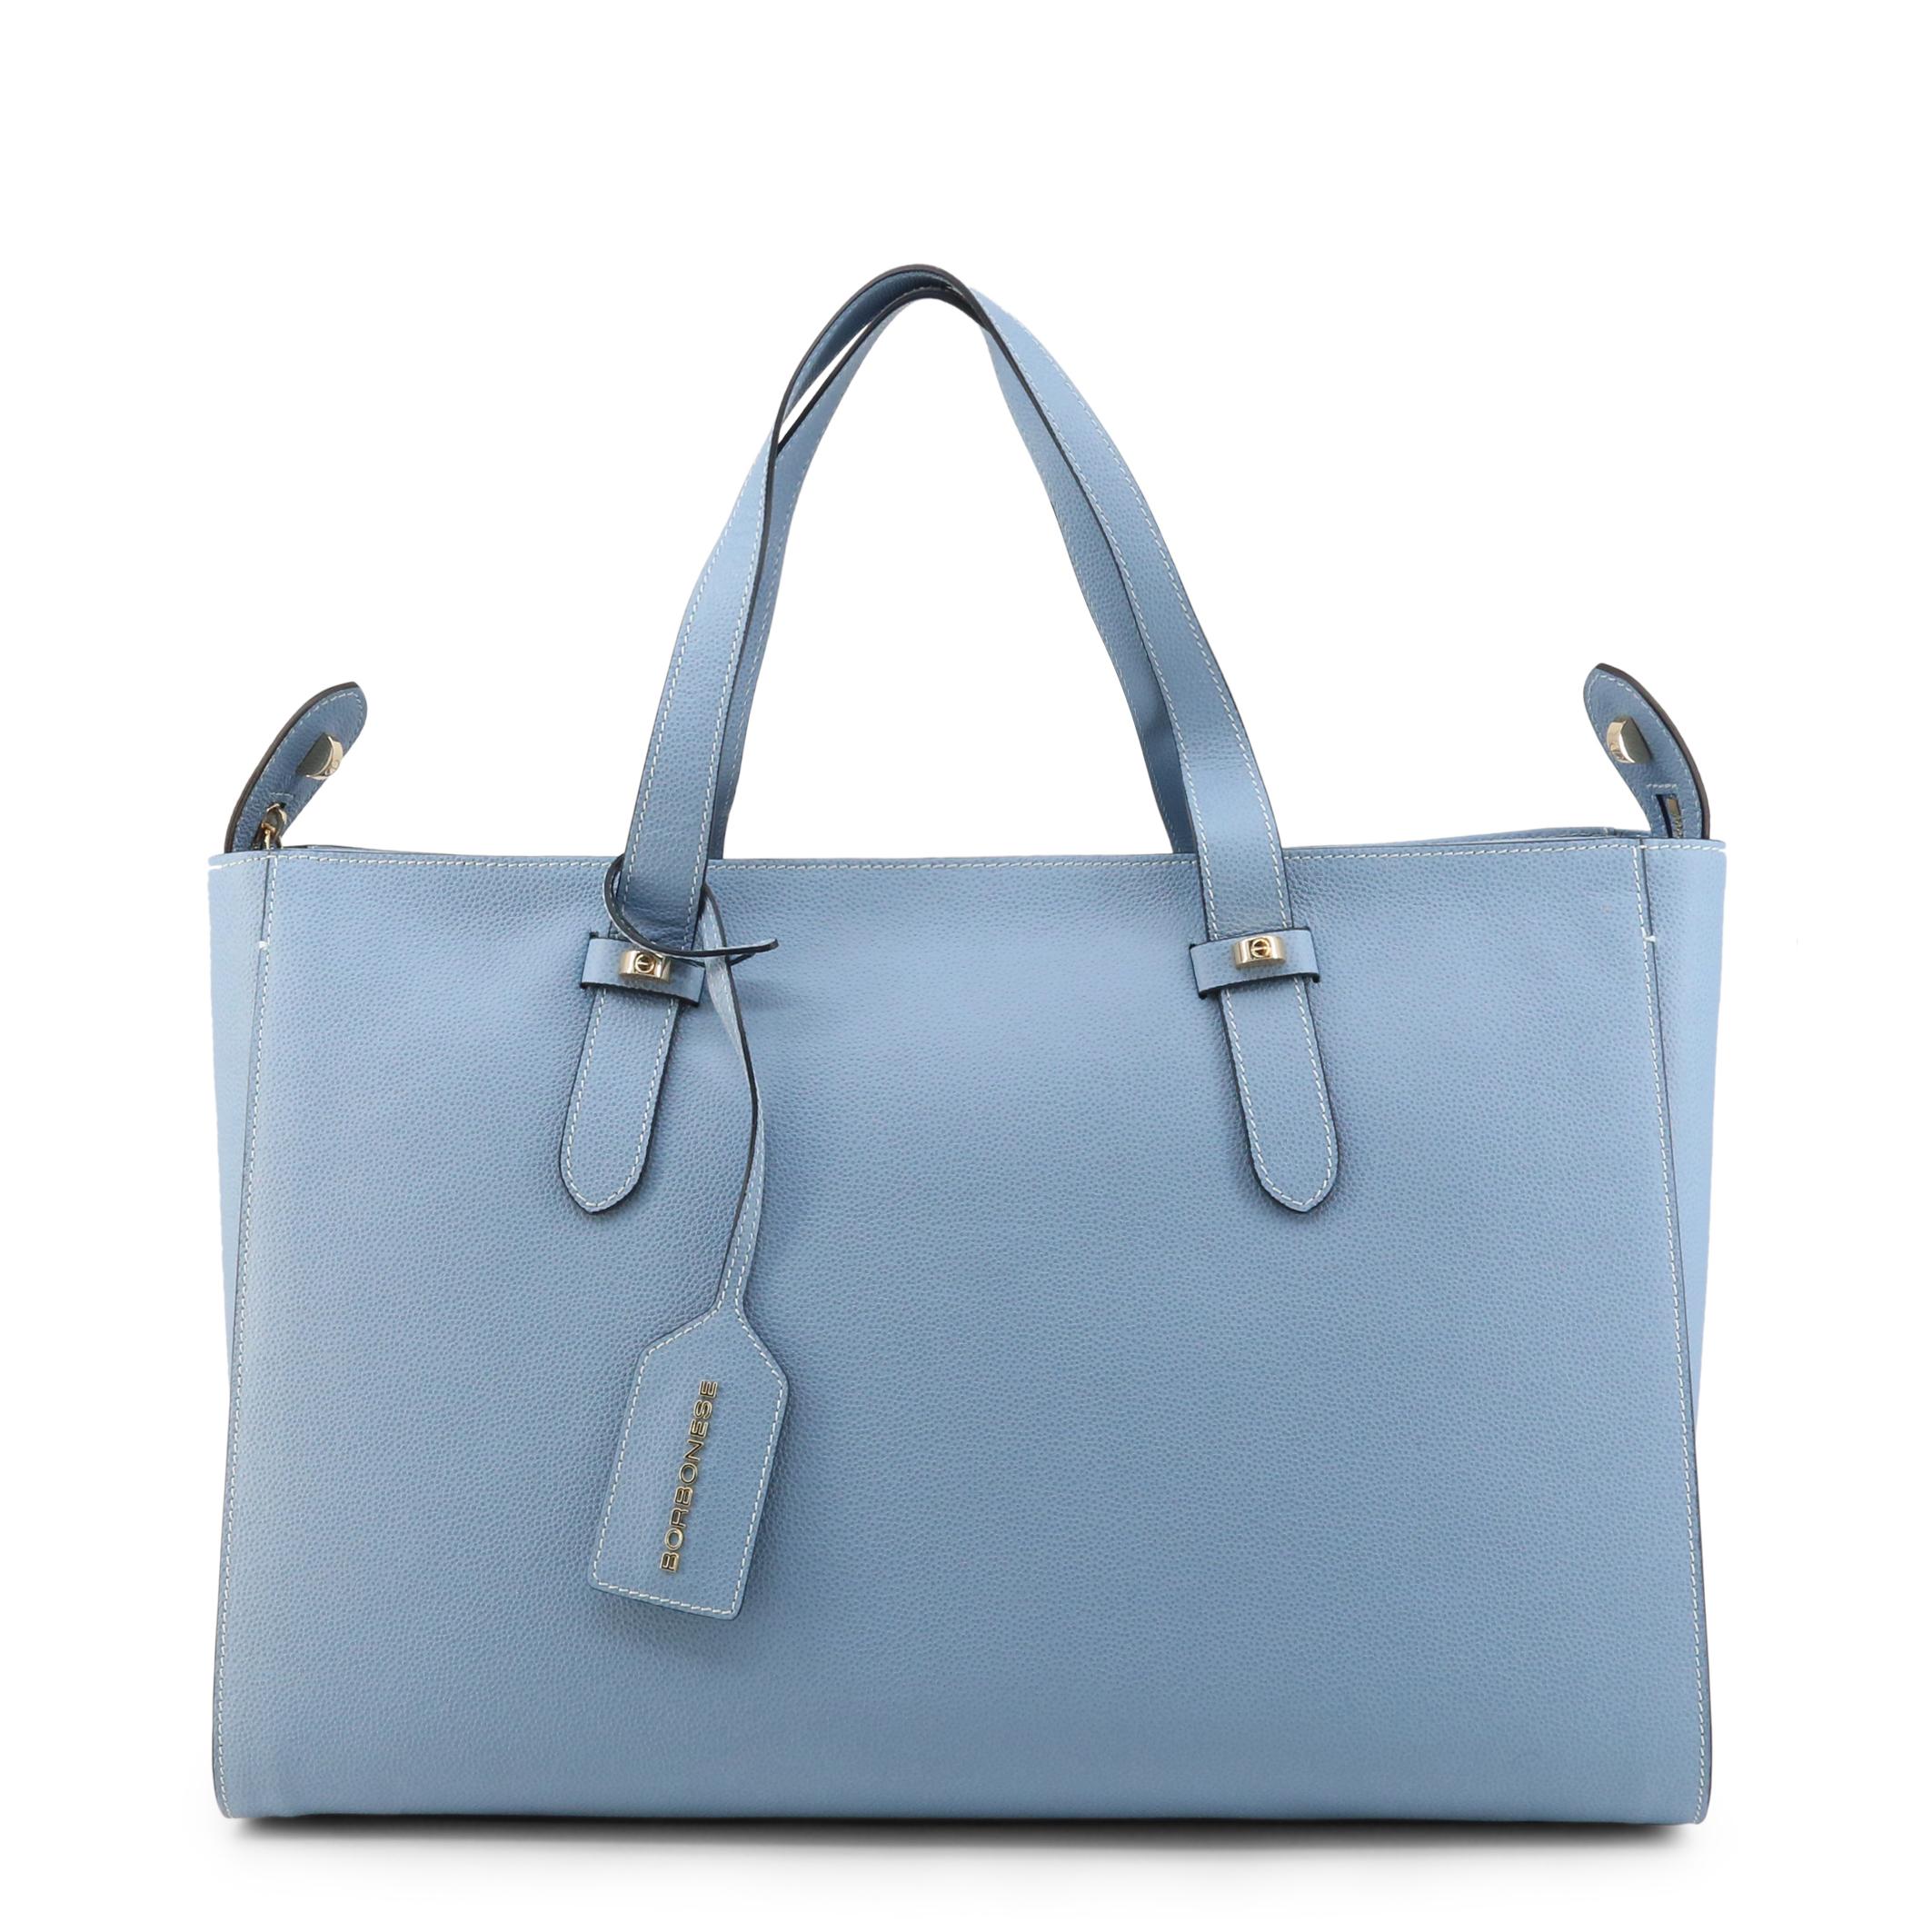 Borbonese - 923680-J04 - Blue